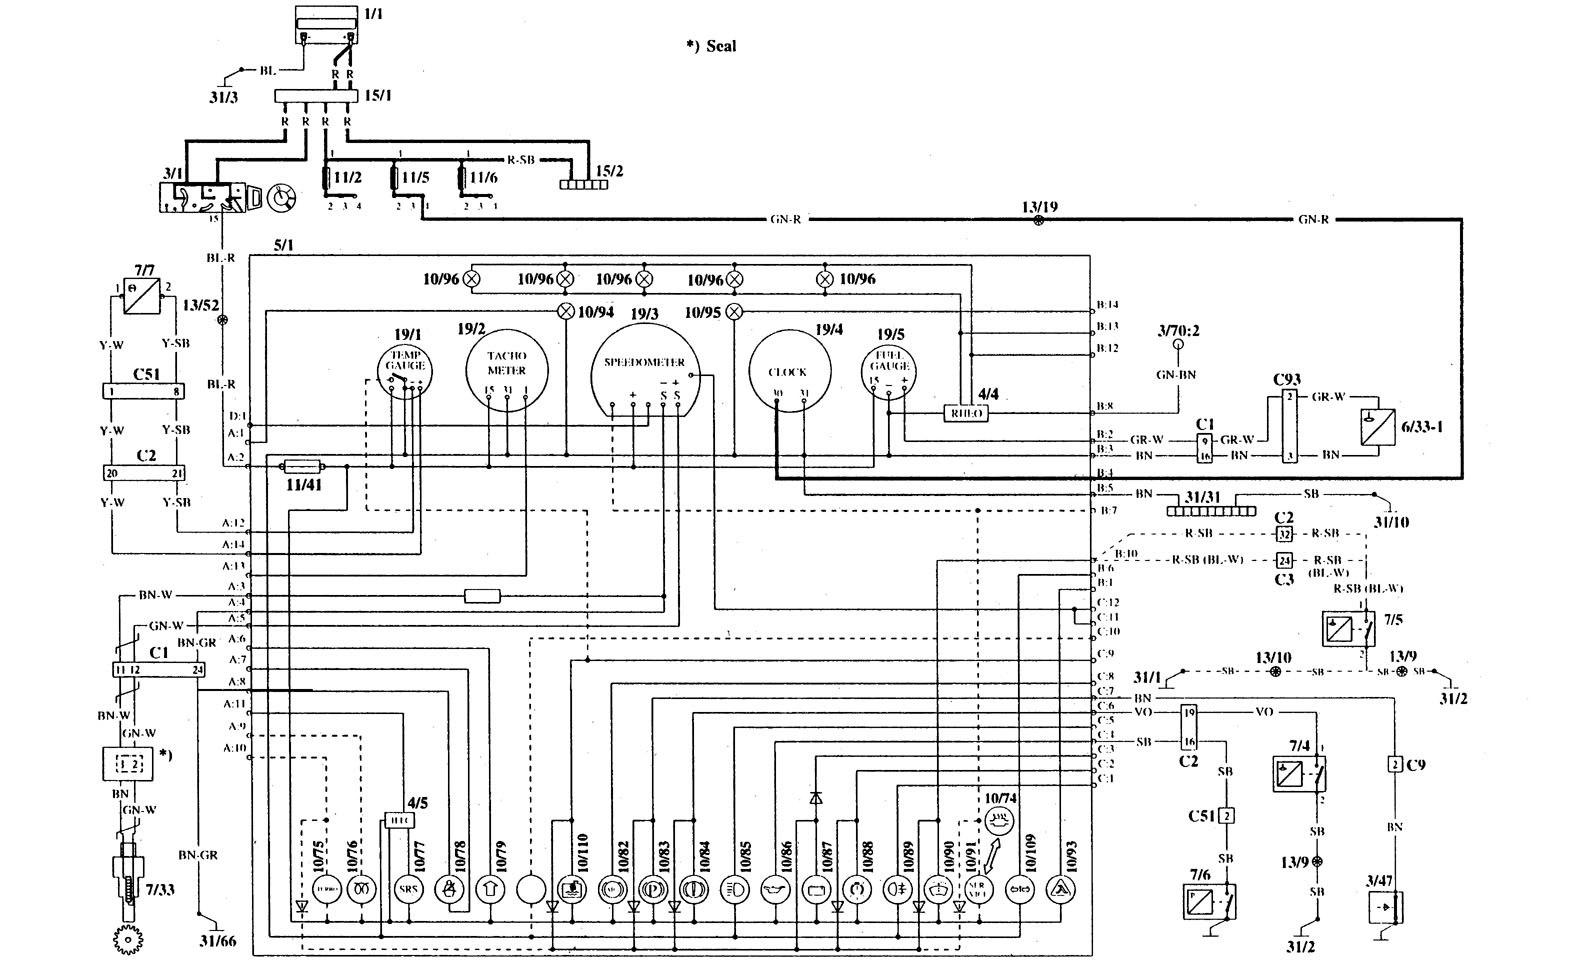 hight resolution of 1995 volvo 940 ac wiring diagram volvo 760 ac wiring diagram volvo 940 1995